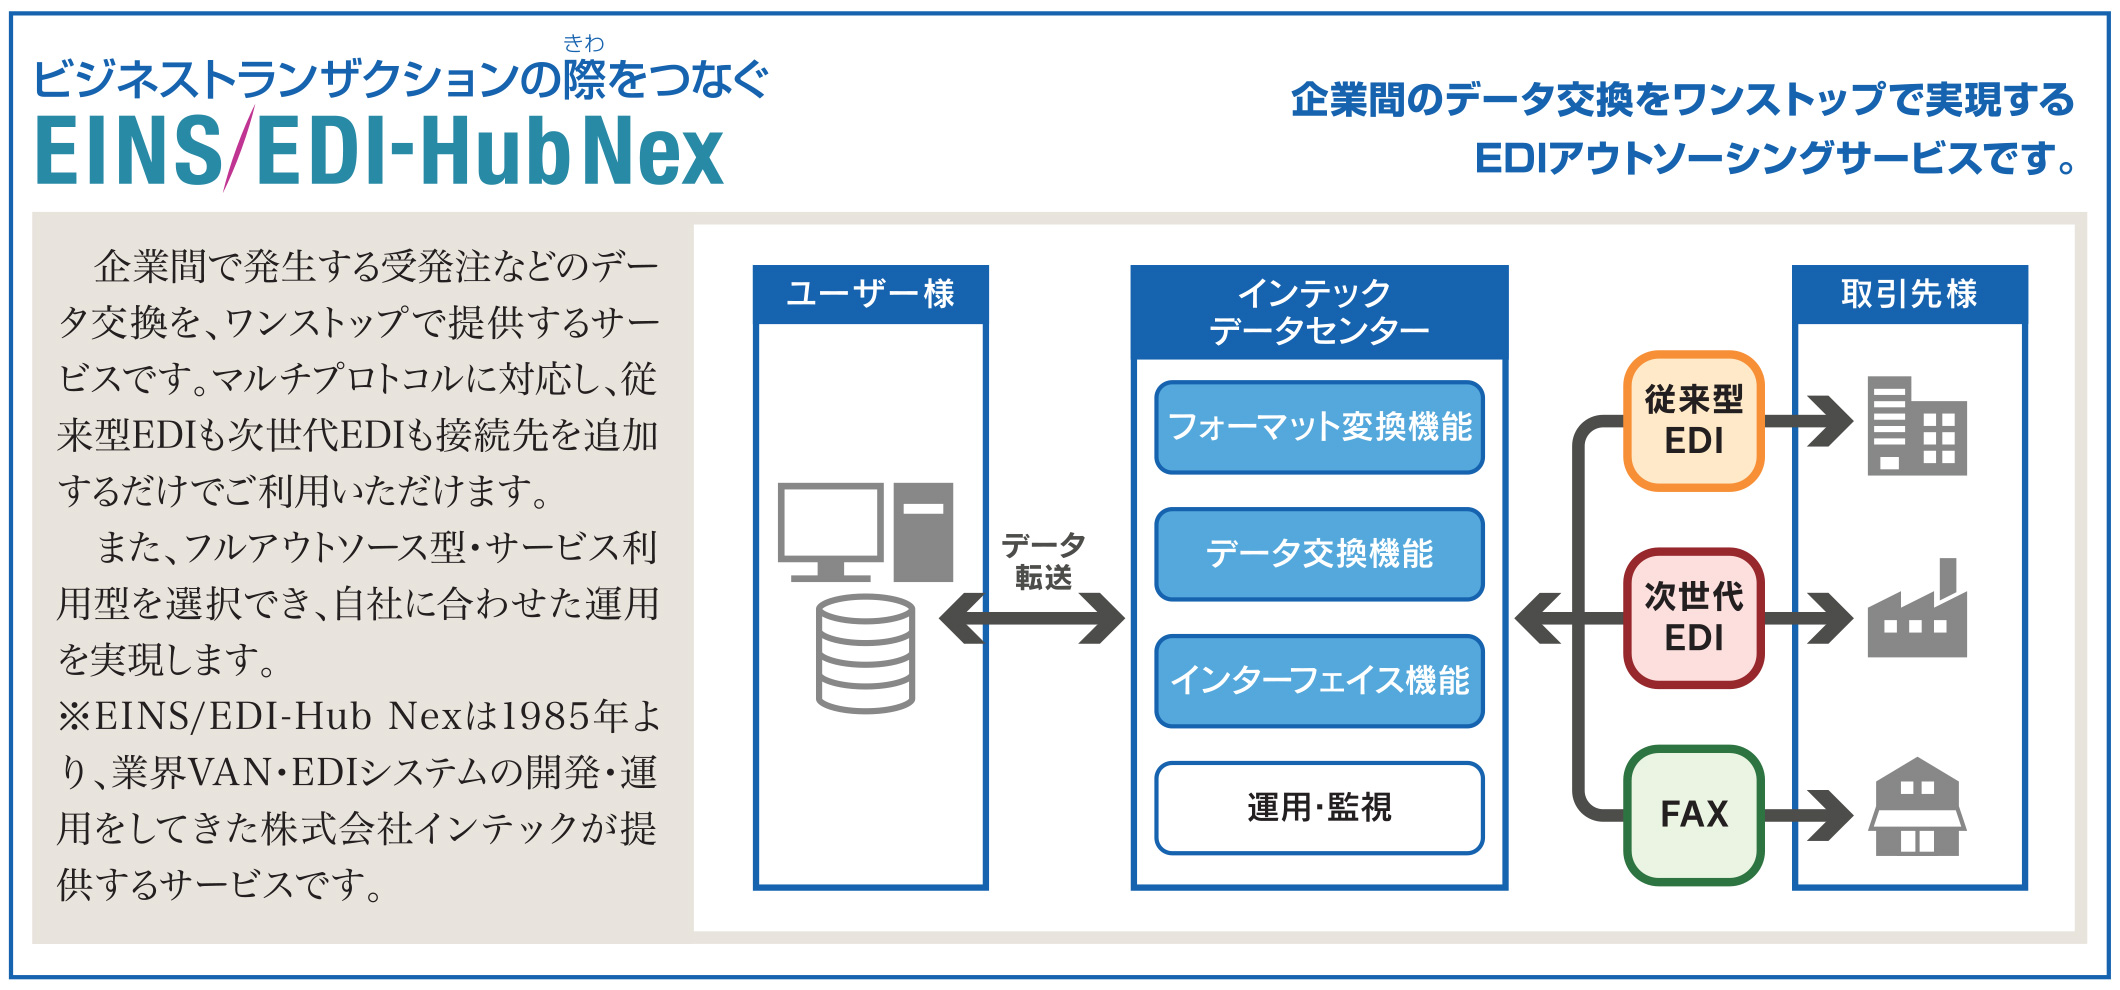 EDI-Hub Nex